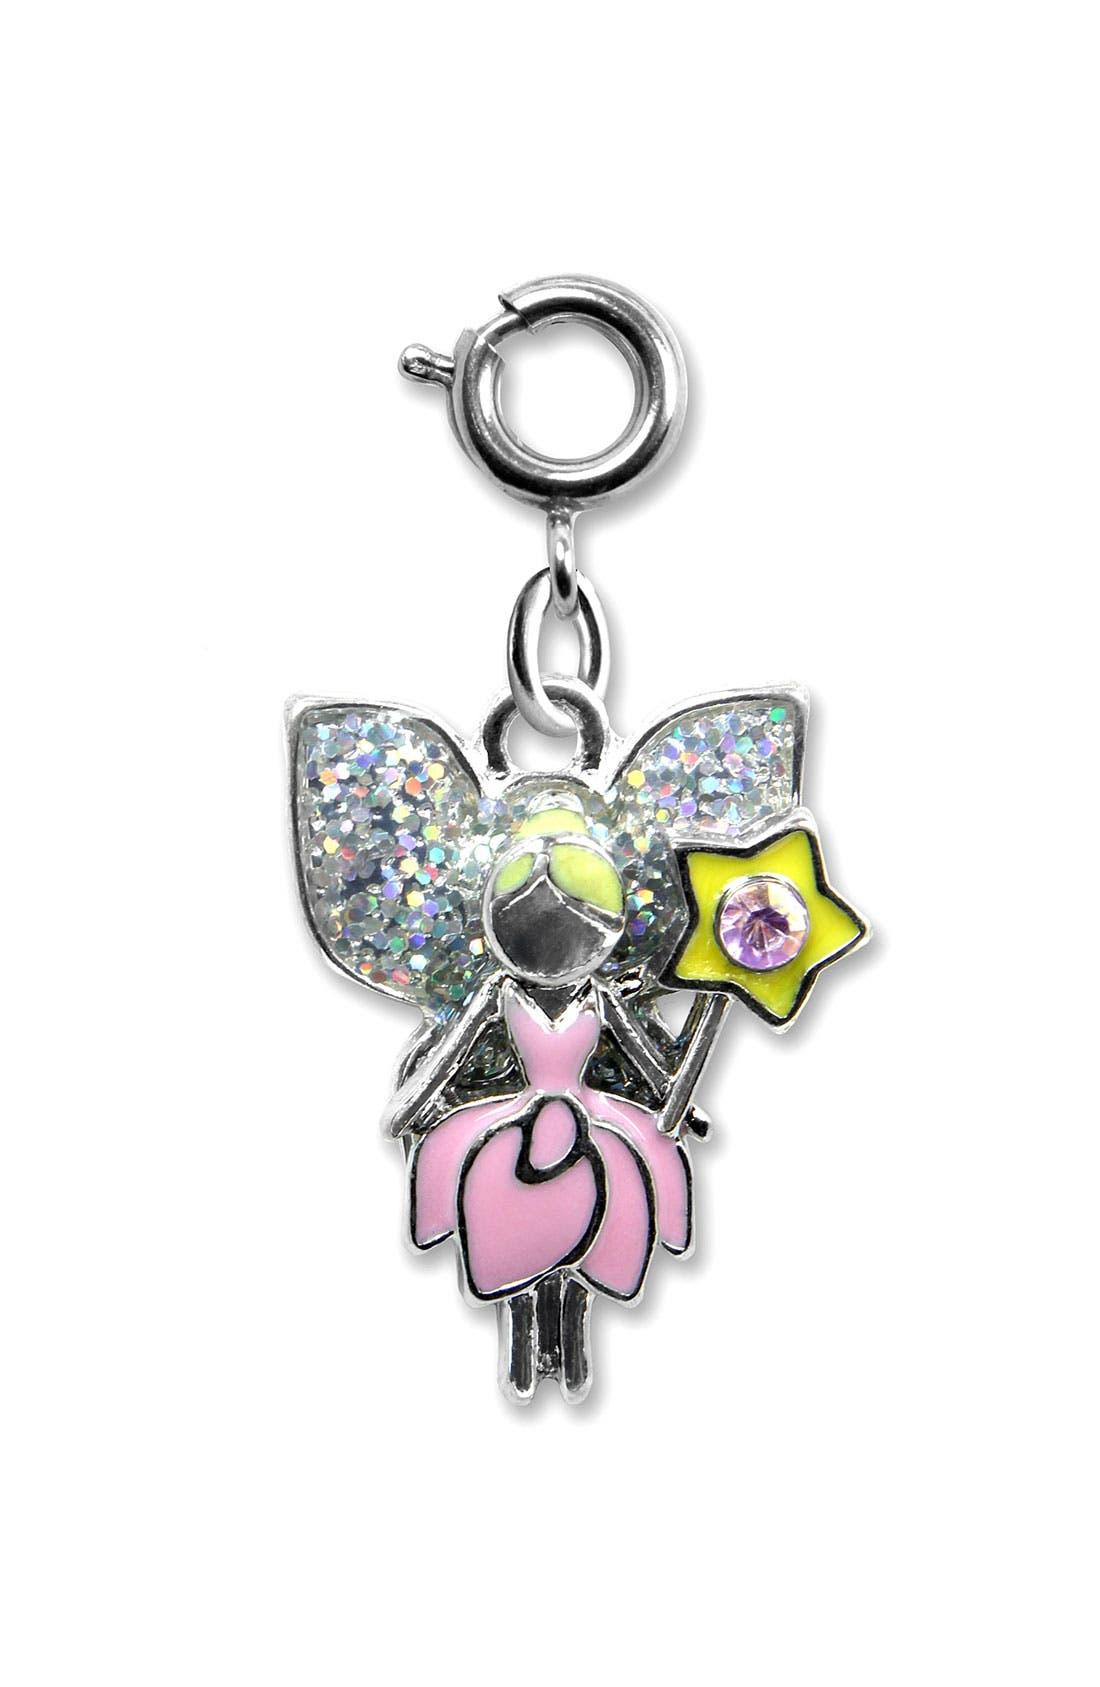 Alternate Image 1 Selected - CHARM IT!® 'Princess Fairytale' Charm (Girls)